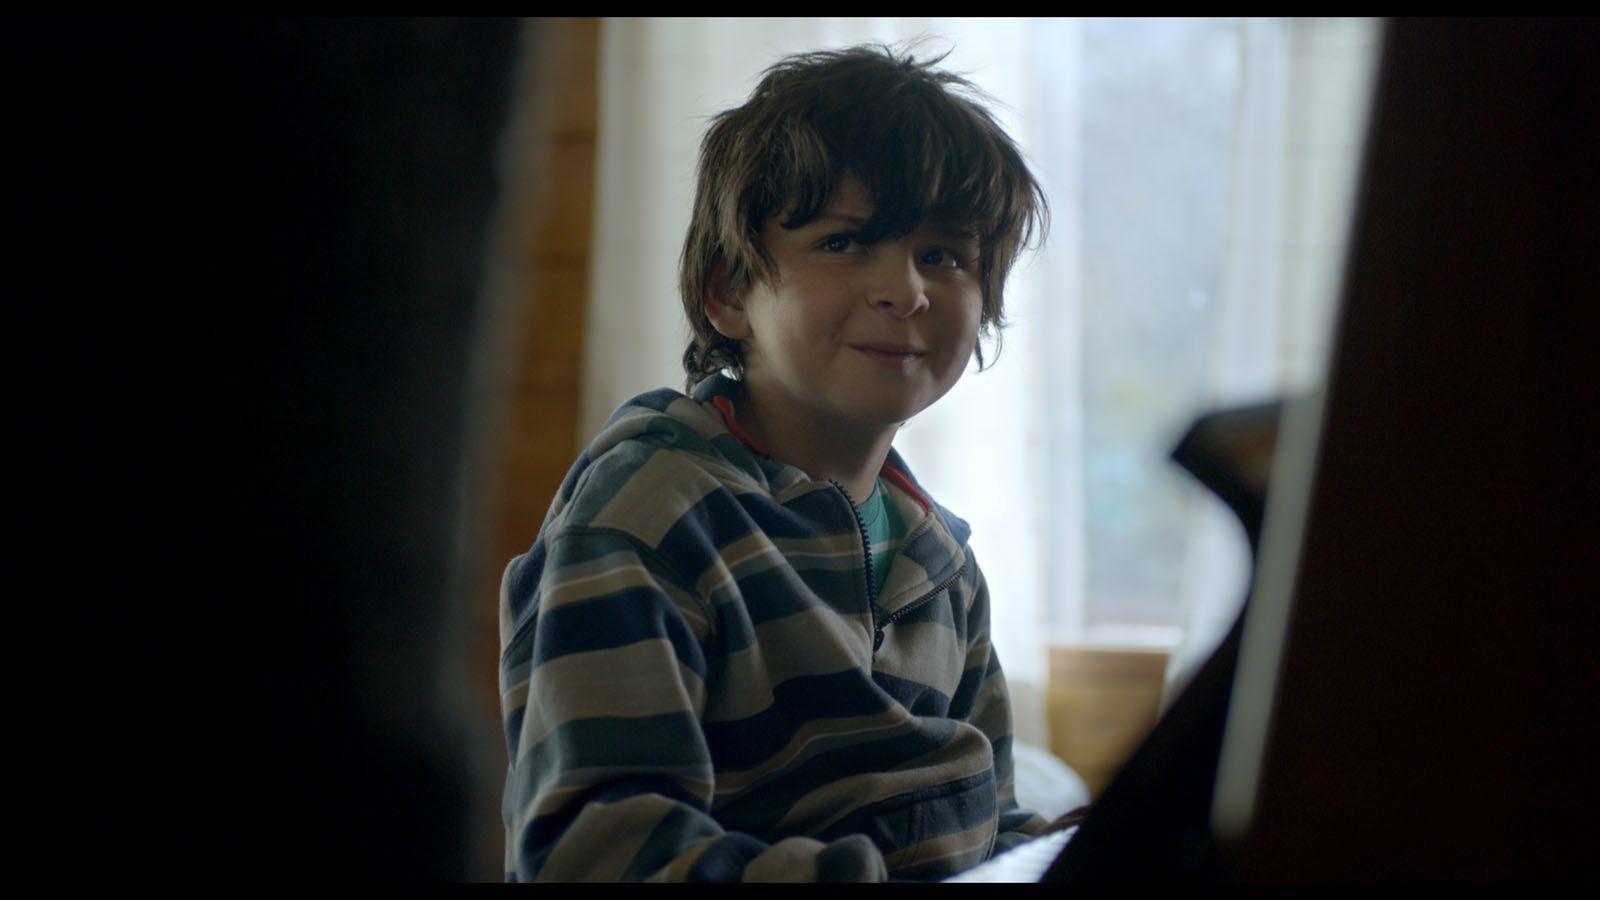 Joel, une enfance en Patagonie (BANDE-ANNONCE) de Carlos Sorín - Le 10 juillet 2019 au cinéma